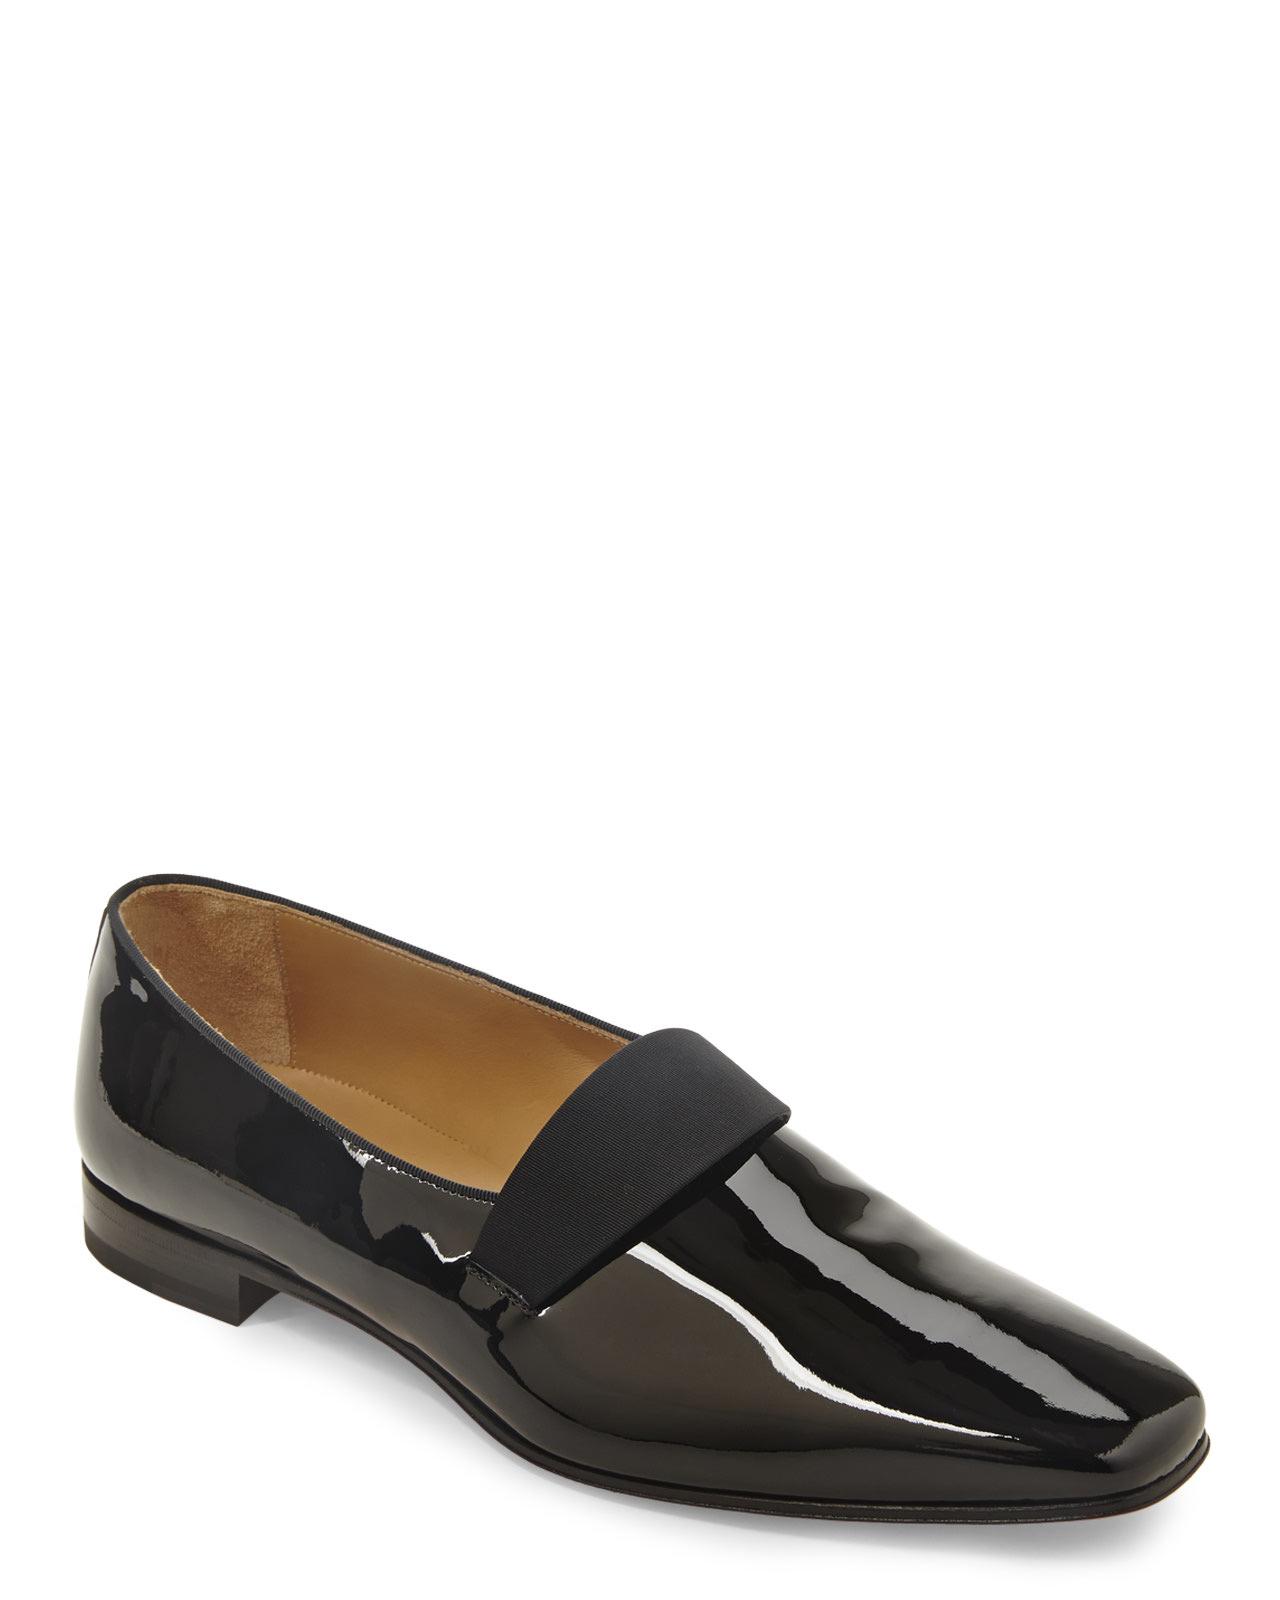 10785f03098 Christian louboutin Black Patent Smoker Flats in Black for Men